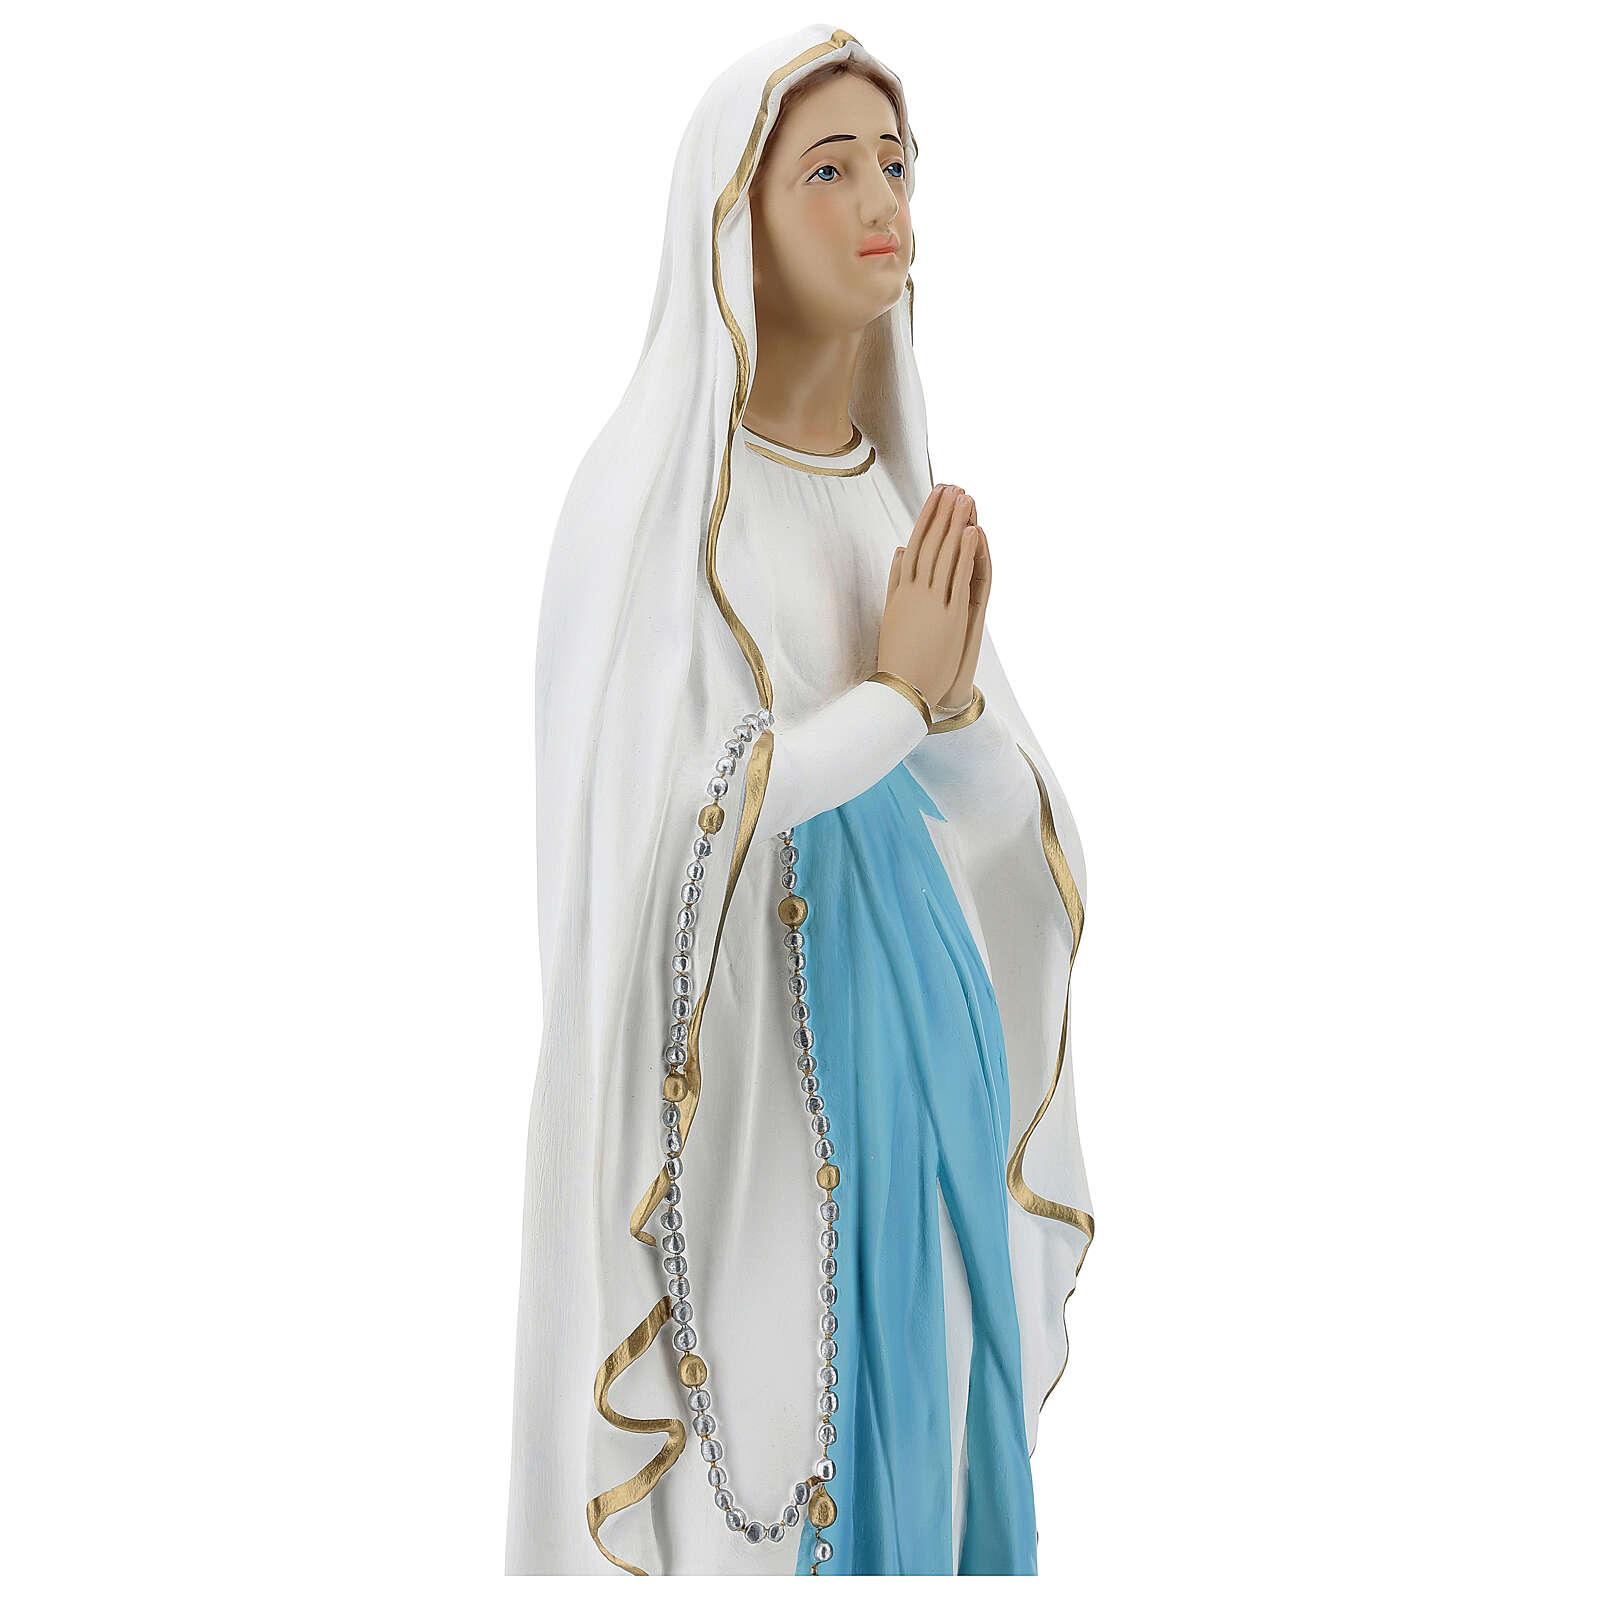 Statua Madonna di Lourdes 75 cm vetroresina dipinta 4